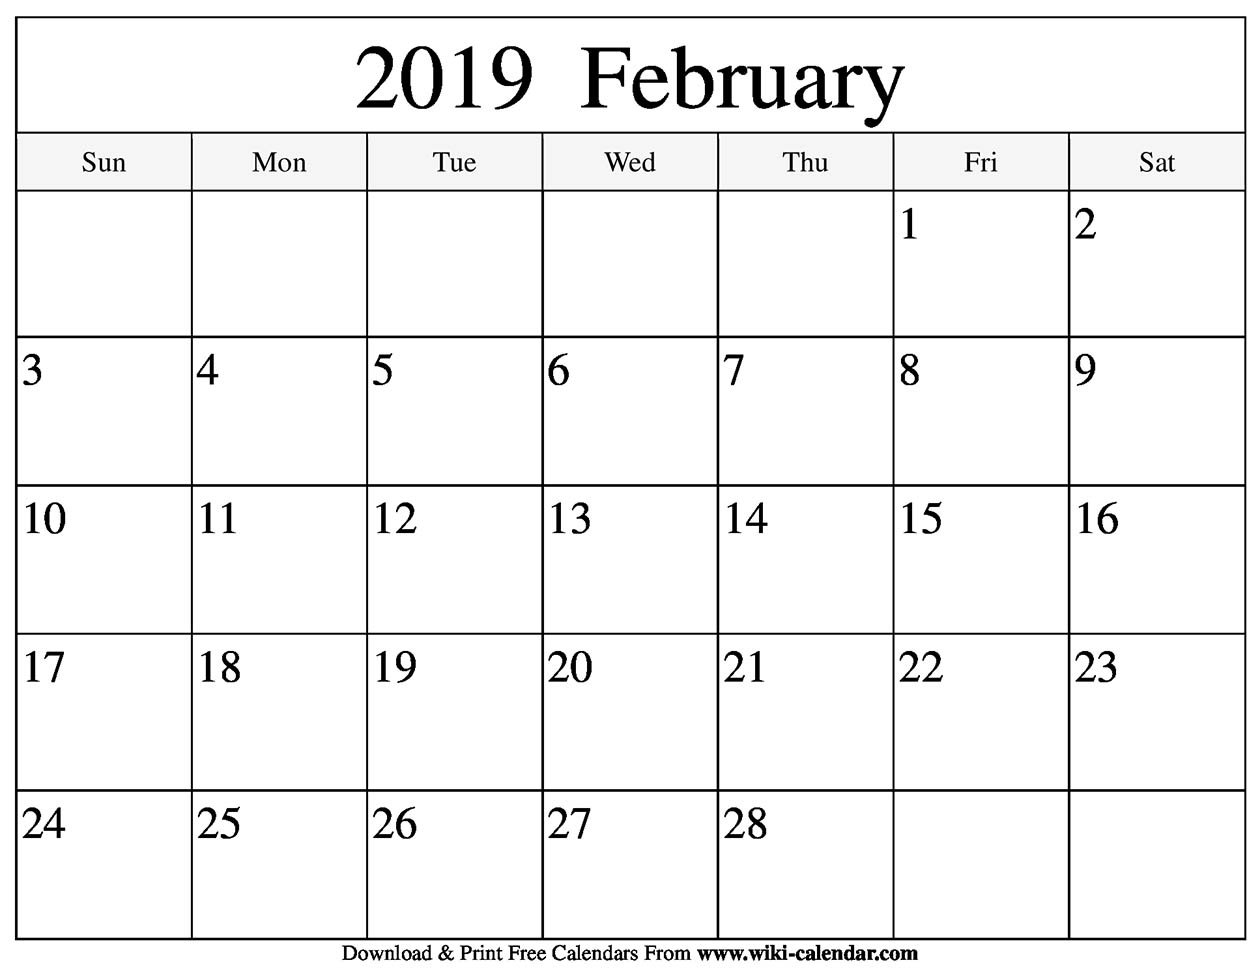 Blank February 2019 Calendar Printable February 4 2019 Calendar